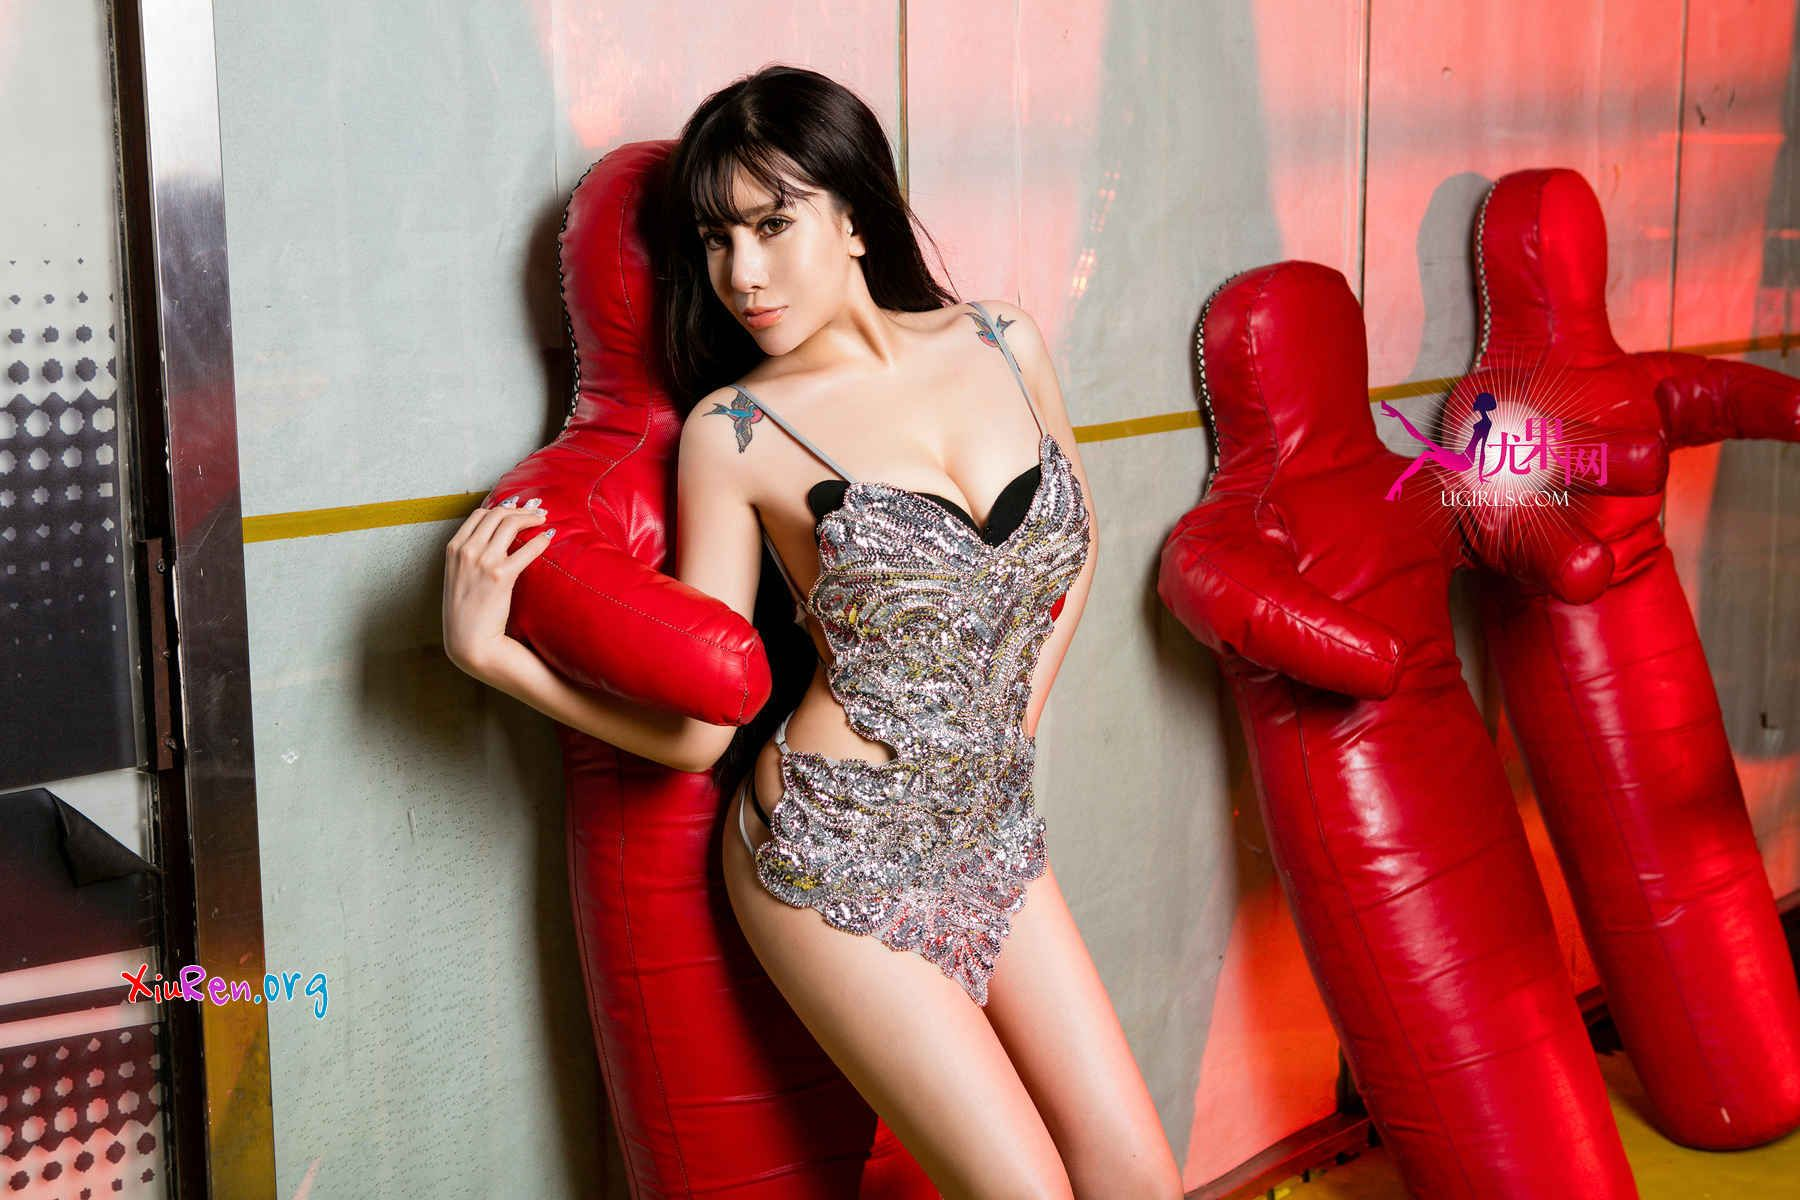 Asian Hot & Sexy Model - [Ugirl] 172 杨佩 Yang Pei | For Video Visit https://www.youtube.com/channel/UCNbFr8qw6ZlJ2lYlyUc-TzA